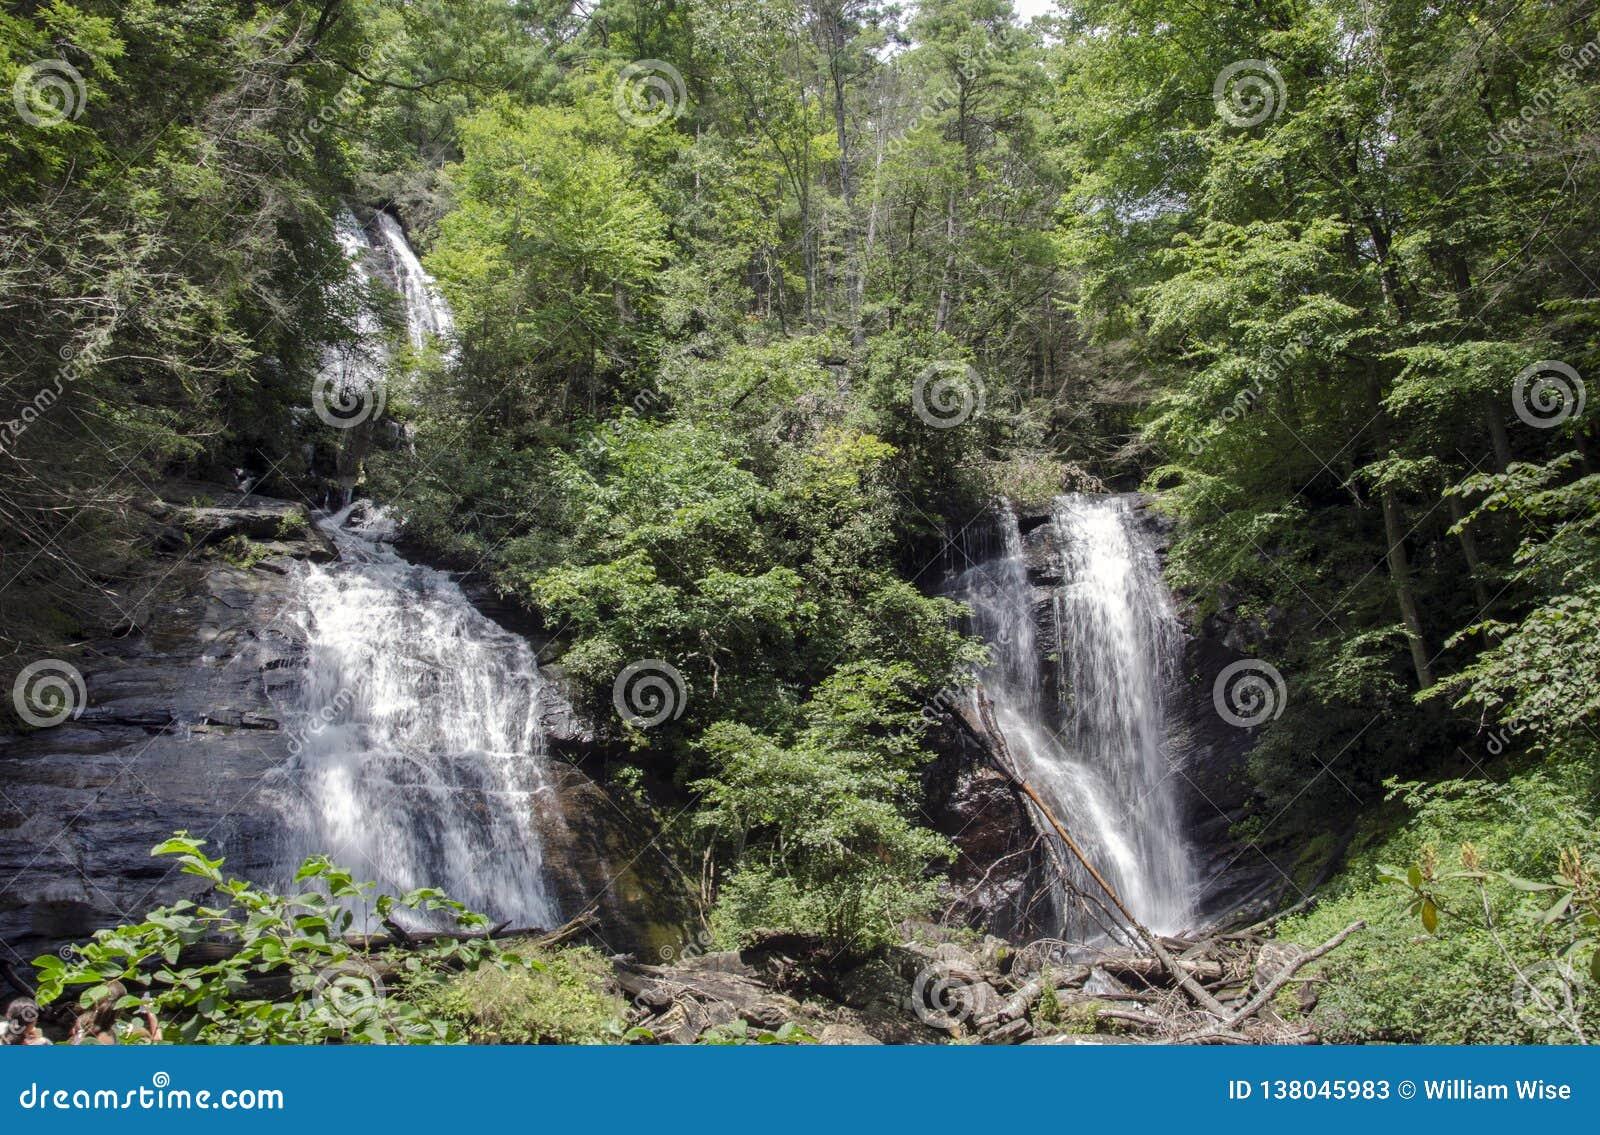 Anna Ruby Falls waterfall in North Georgia, USA